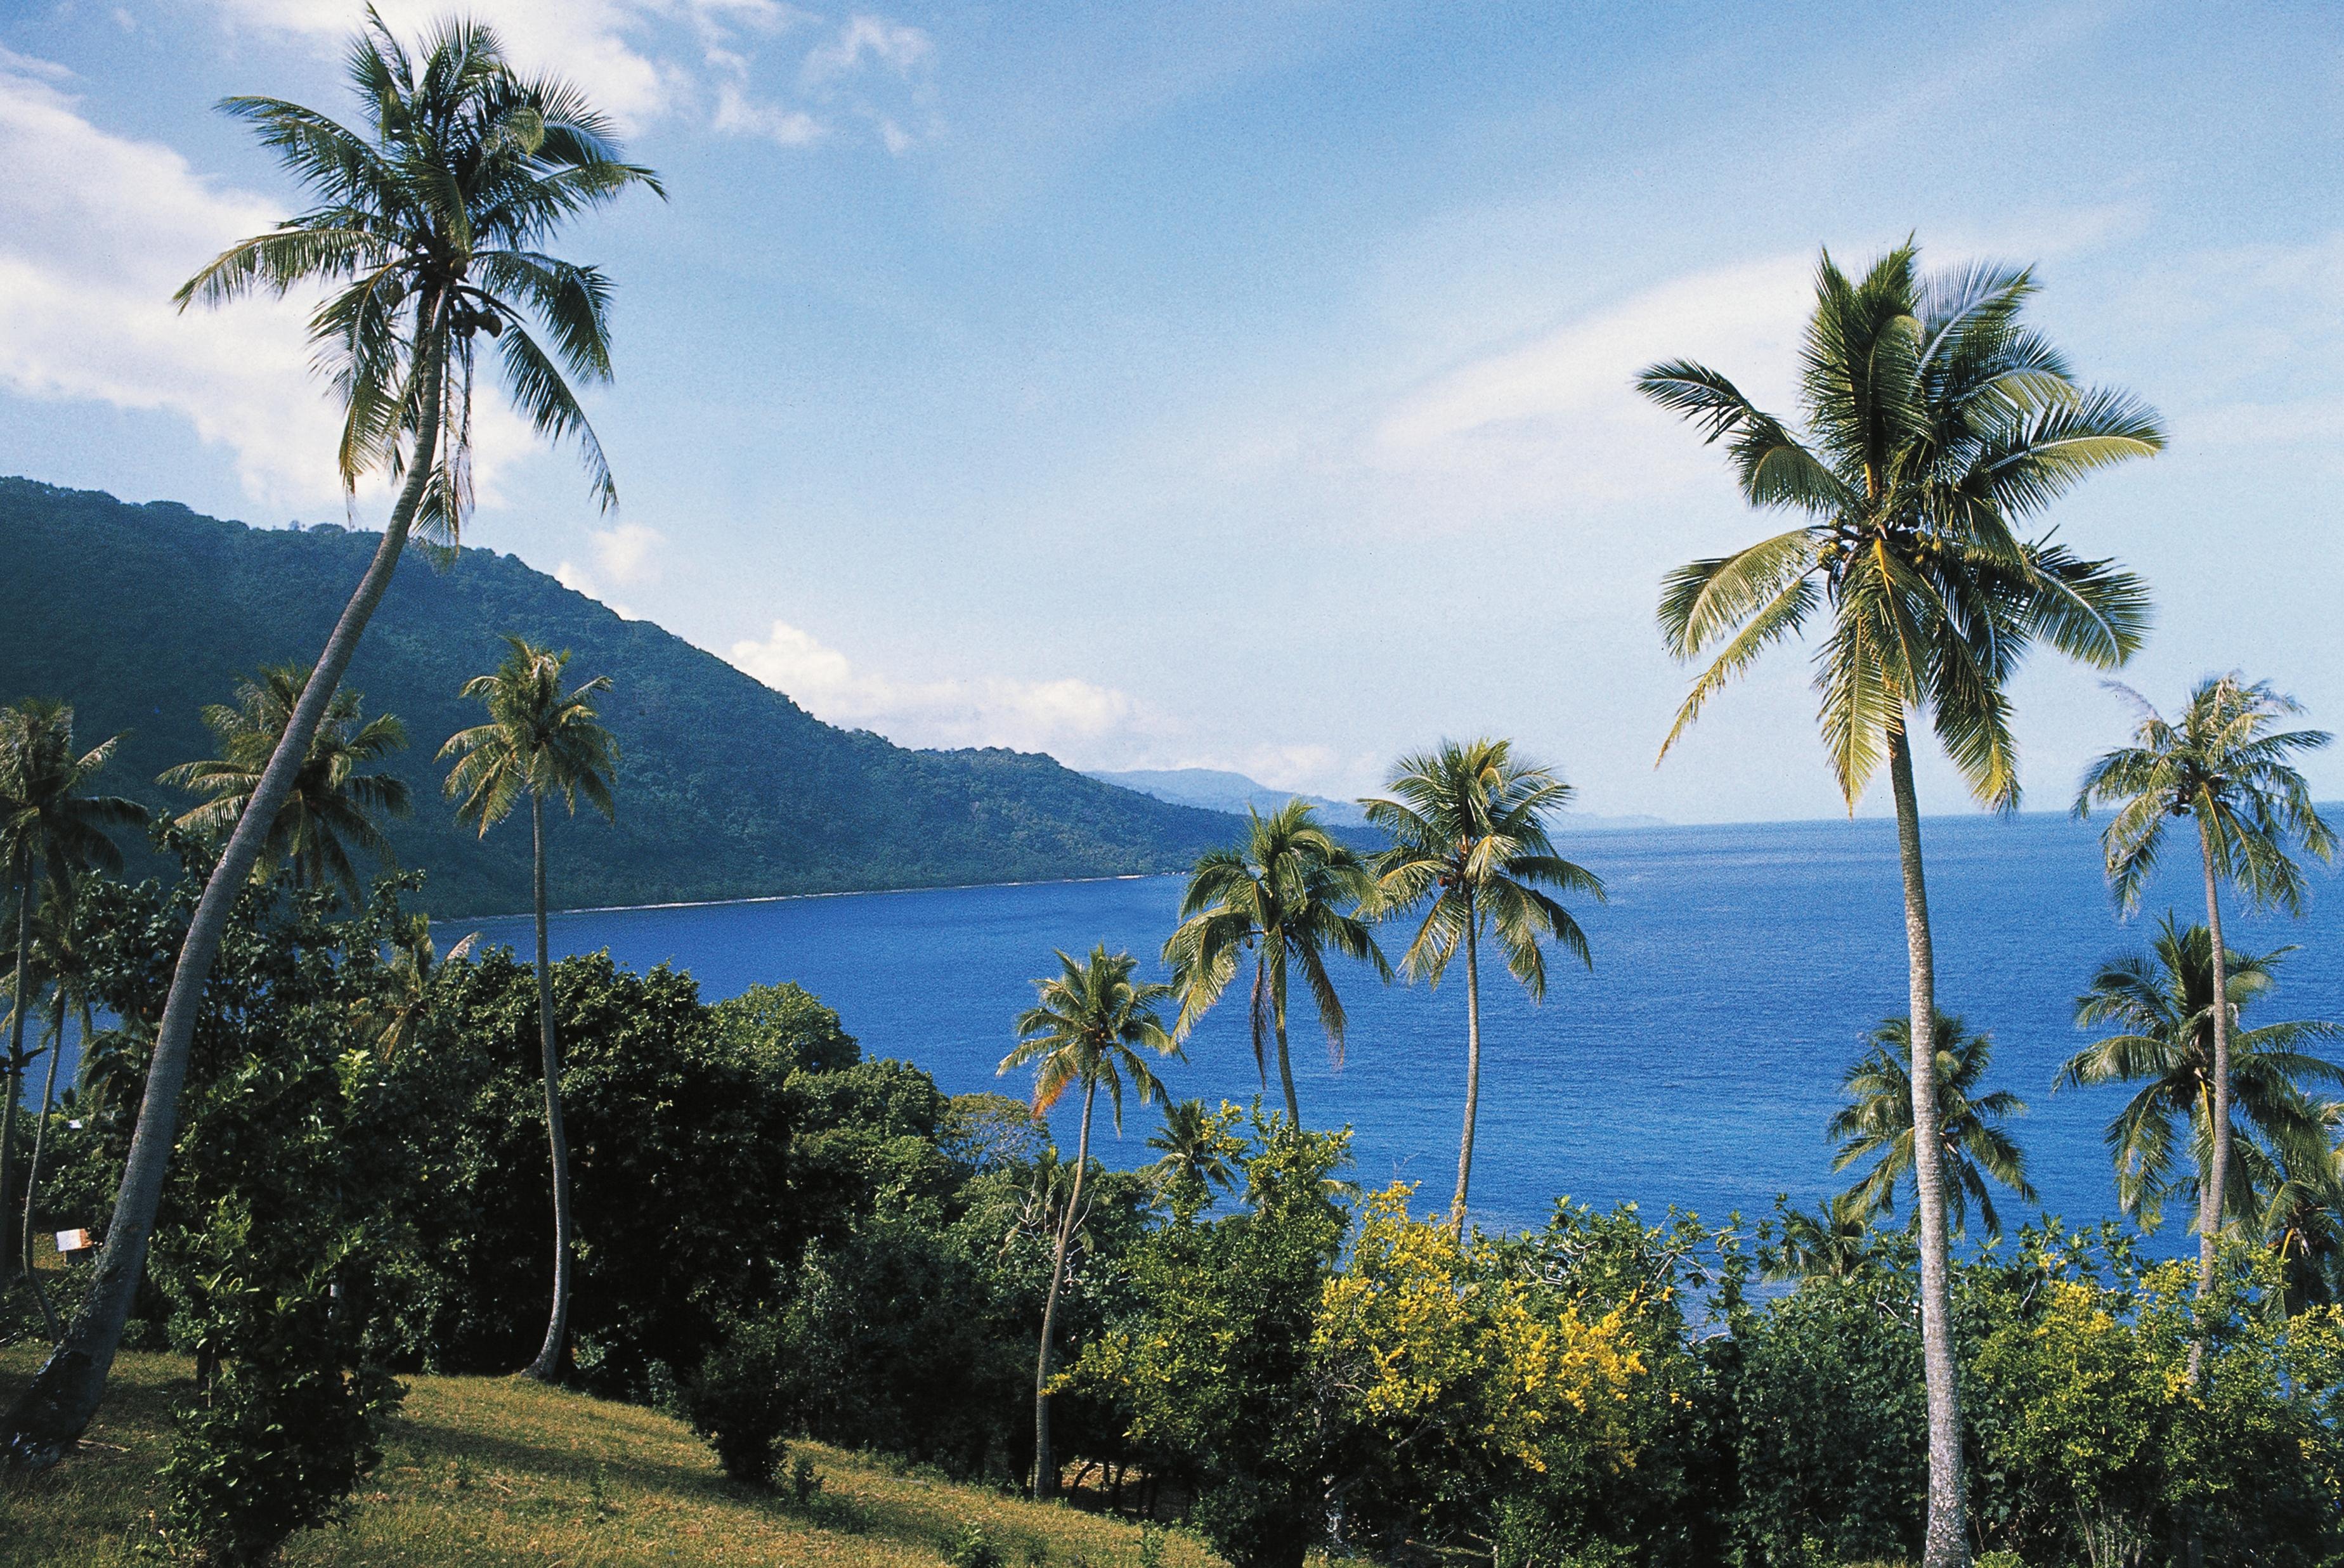 The coastline near Melsisi, Pentecost Island, Vanuatu.